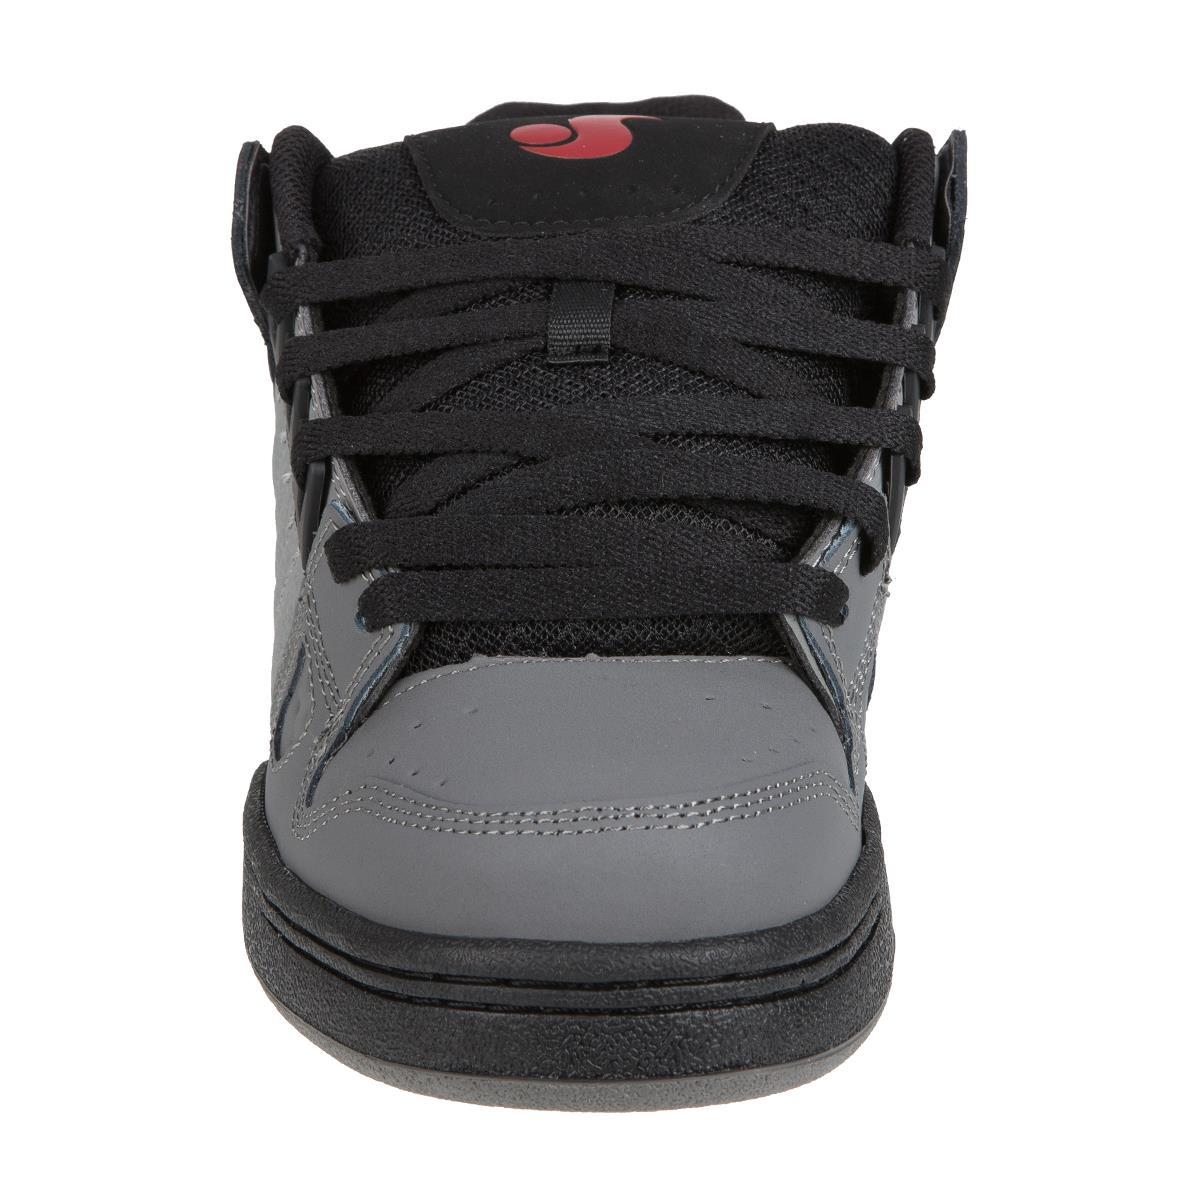 DVS Schuhe Celsius CharcoalGrauSchwarz Nubuk